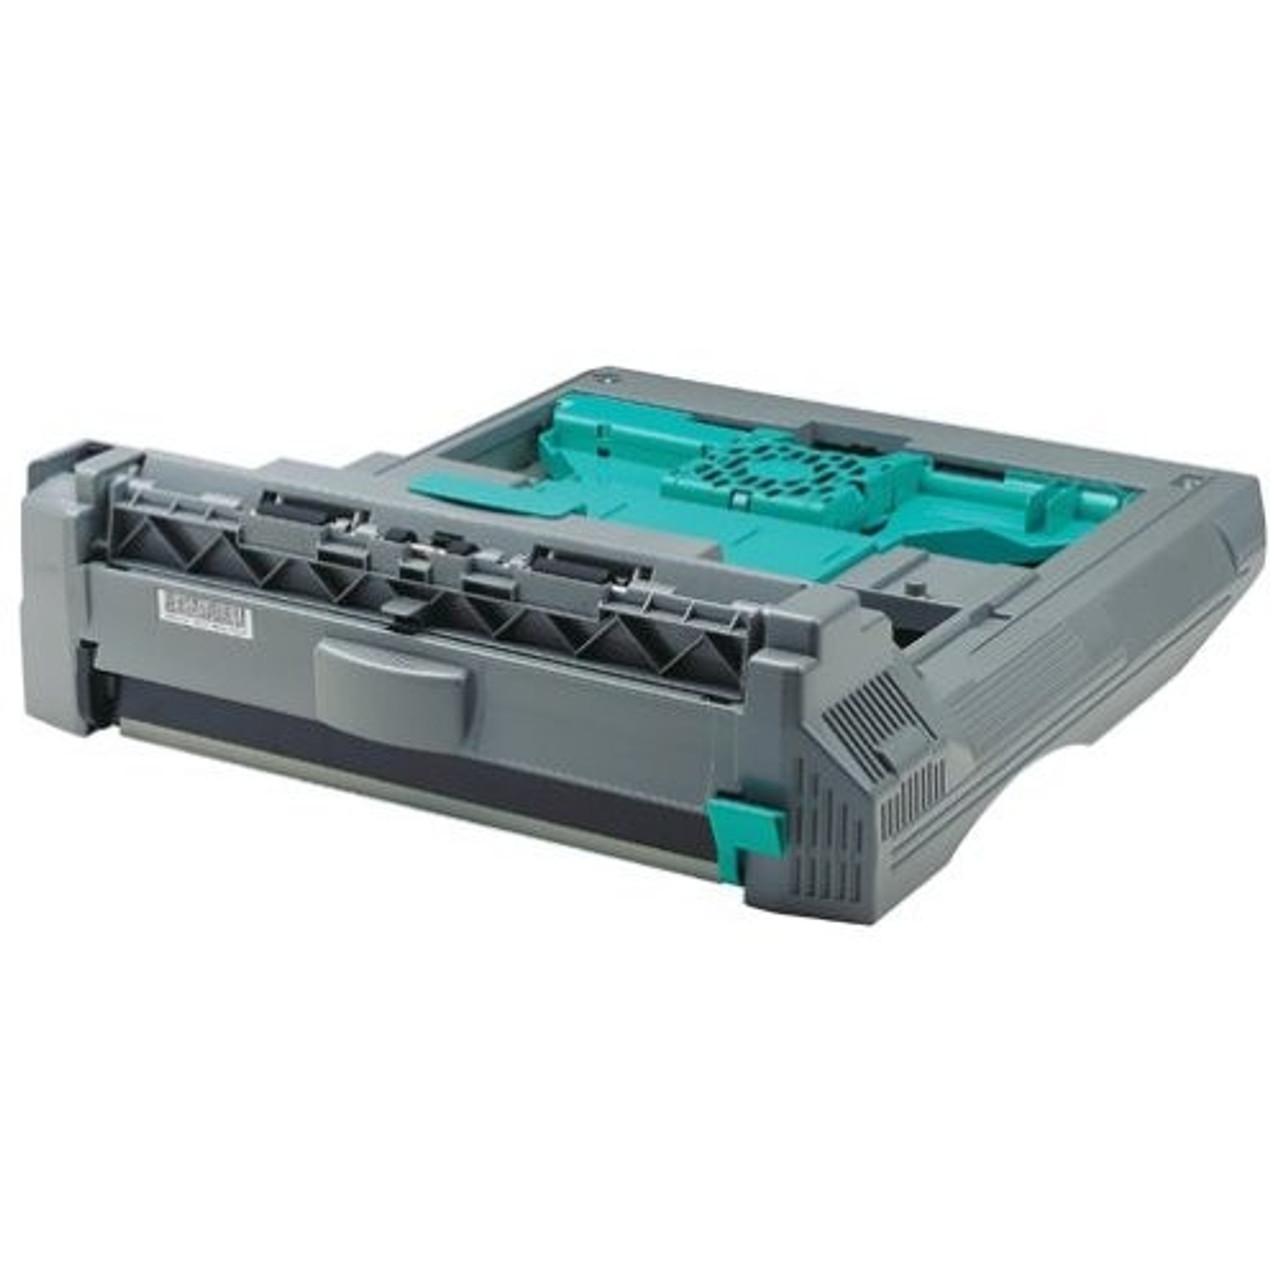 LaserJet 9000 9040 9050 Series Duplex Assembly C8532A